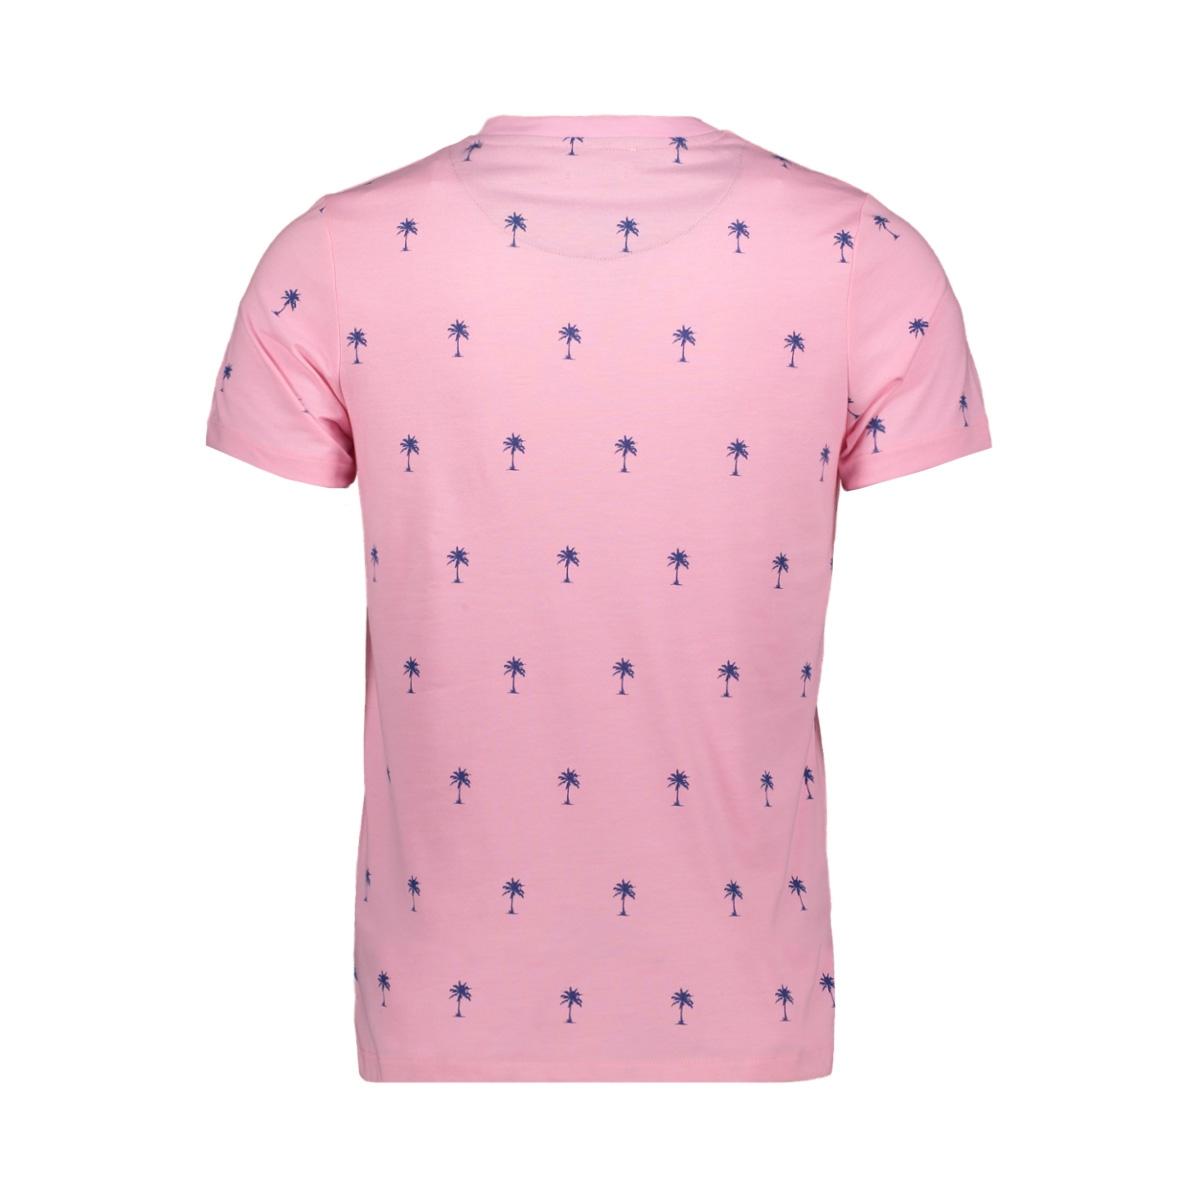 jprsean tee ss crew neck exp sc 12152785 jack & jones t-shirt prism pink